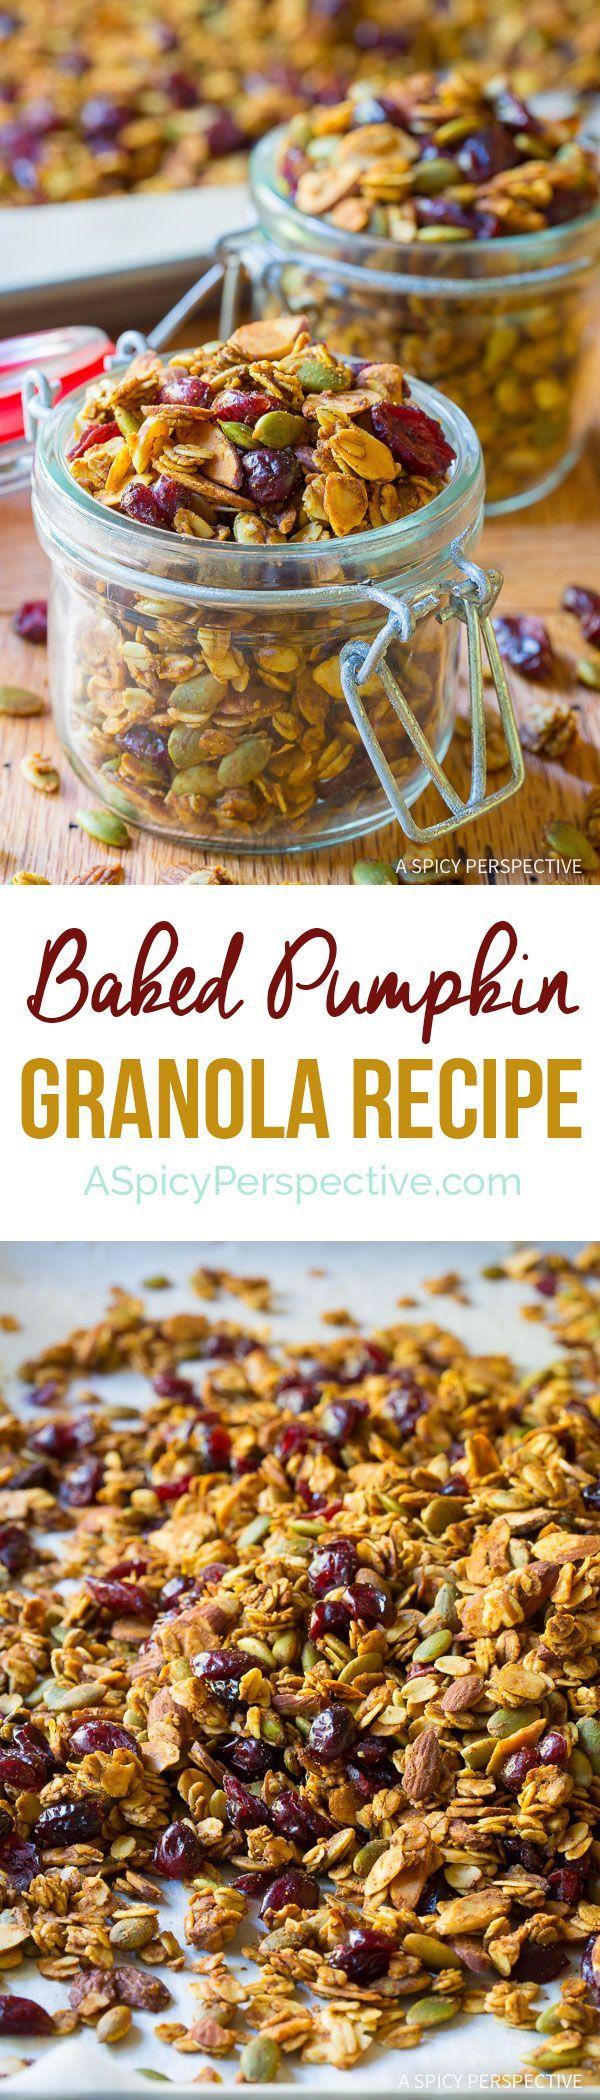 Tastes Like Fall! Baked Pumpkin Granola Recipe on ASpicyPerspective...